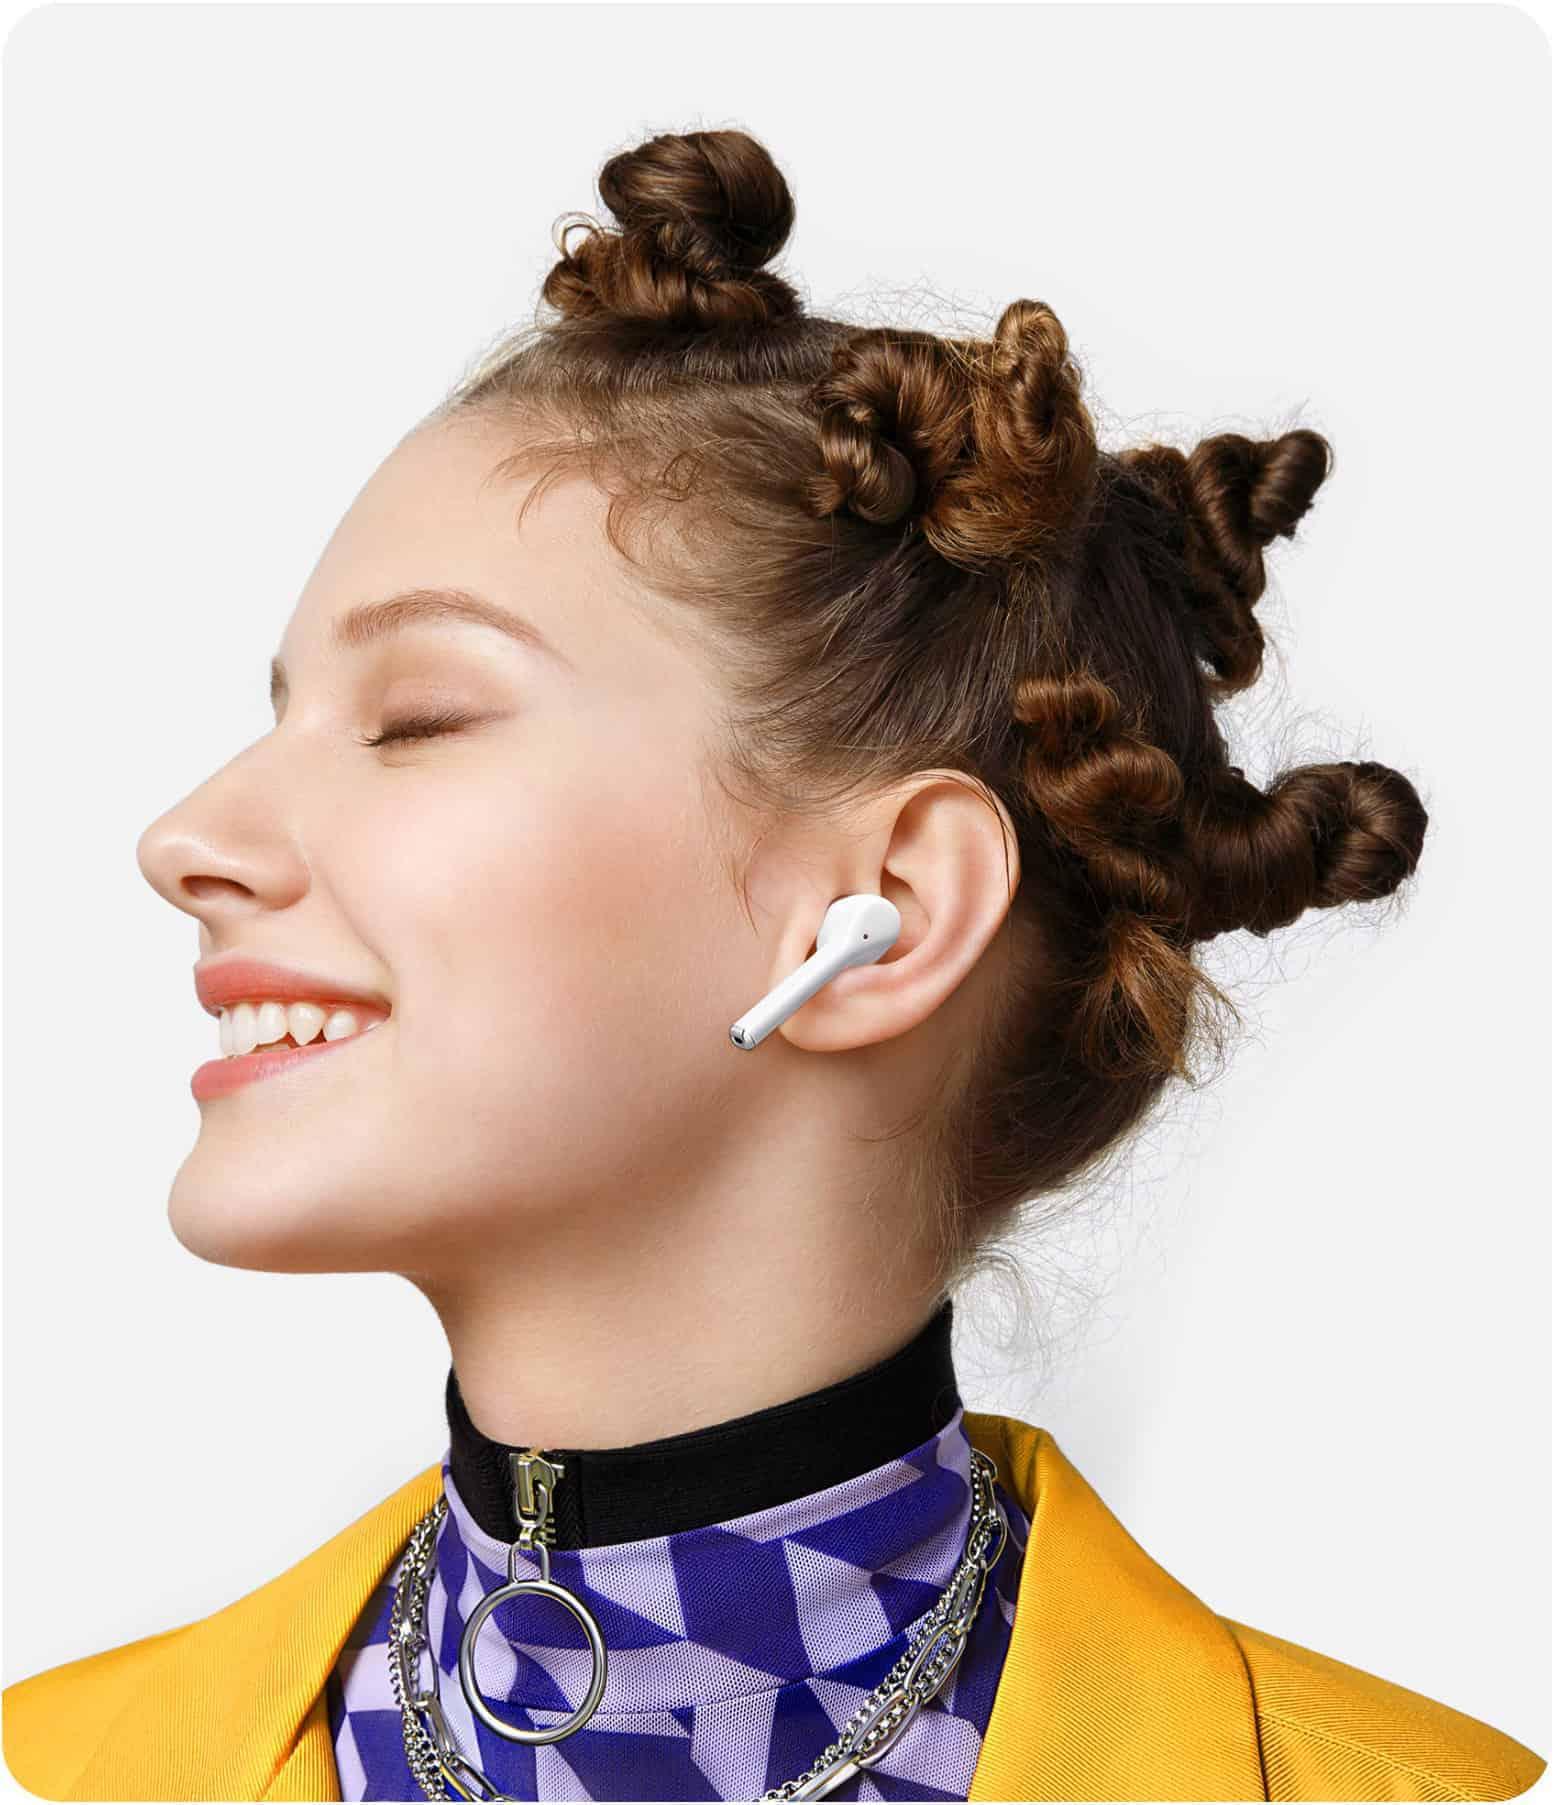 Review: Huawei FreeBuds 3i